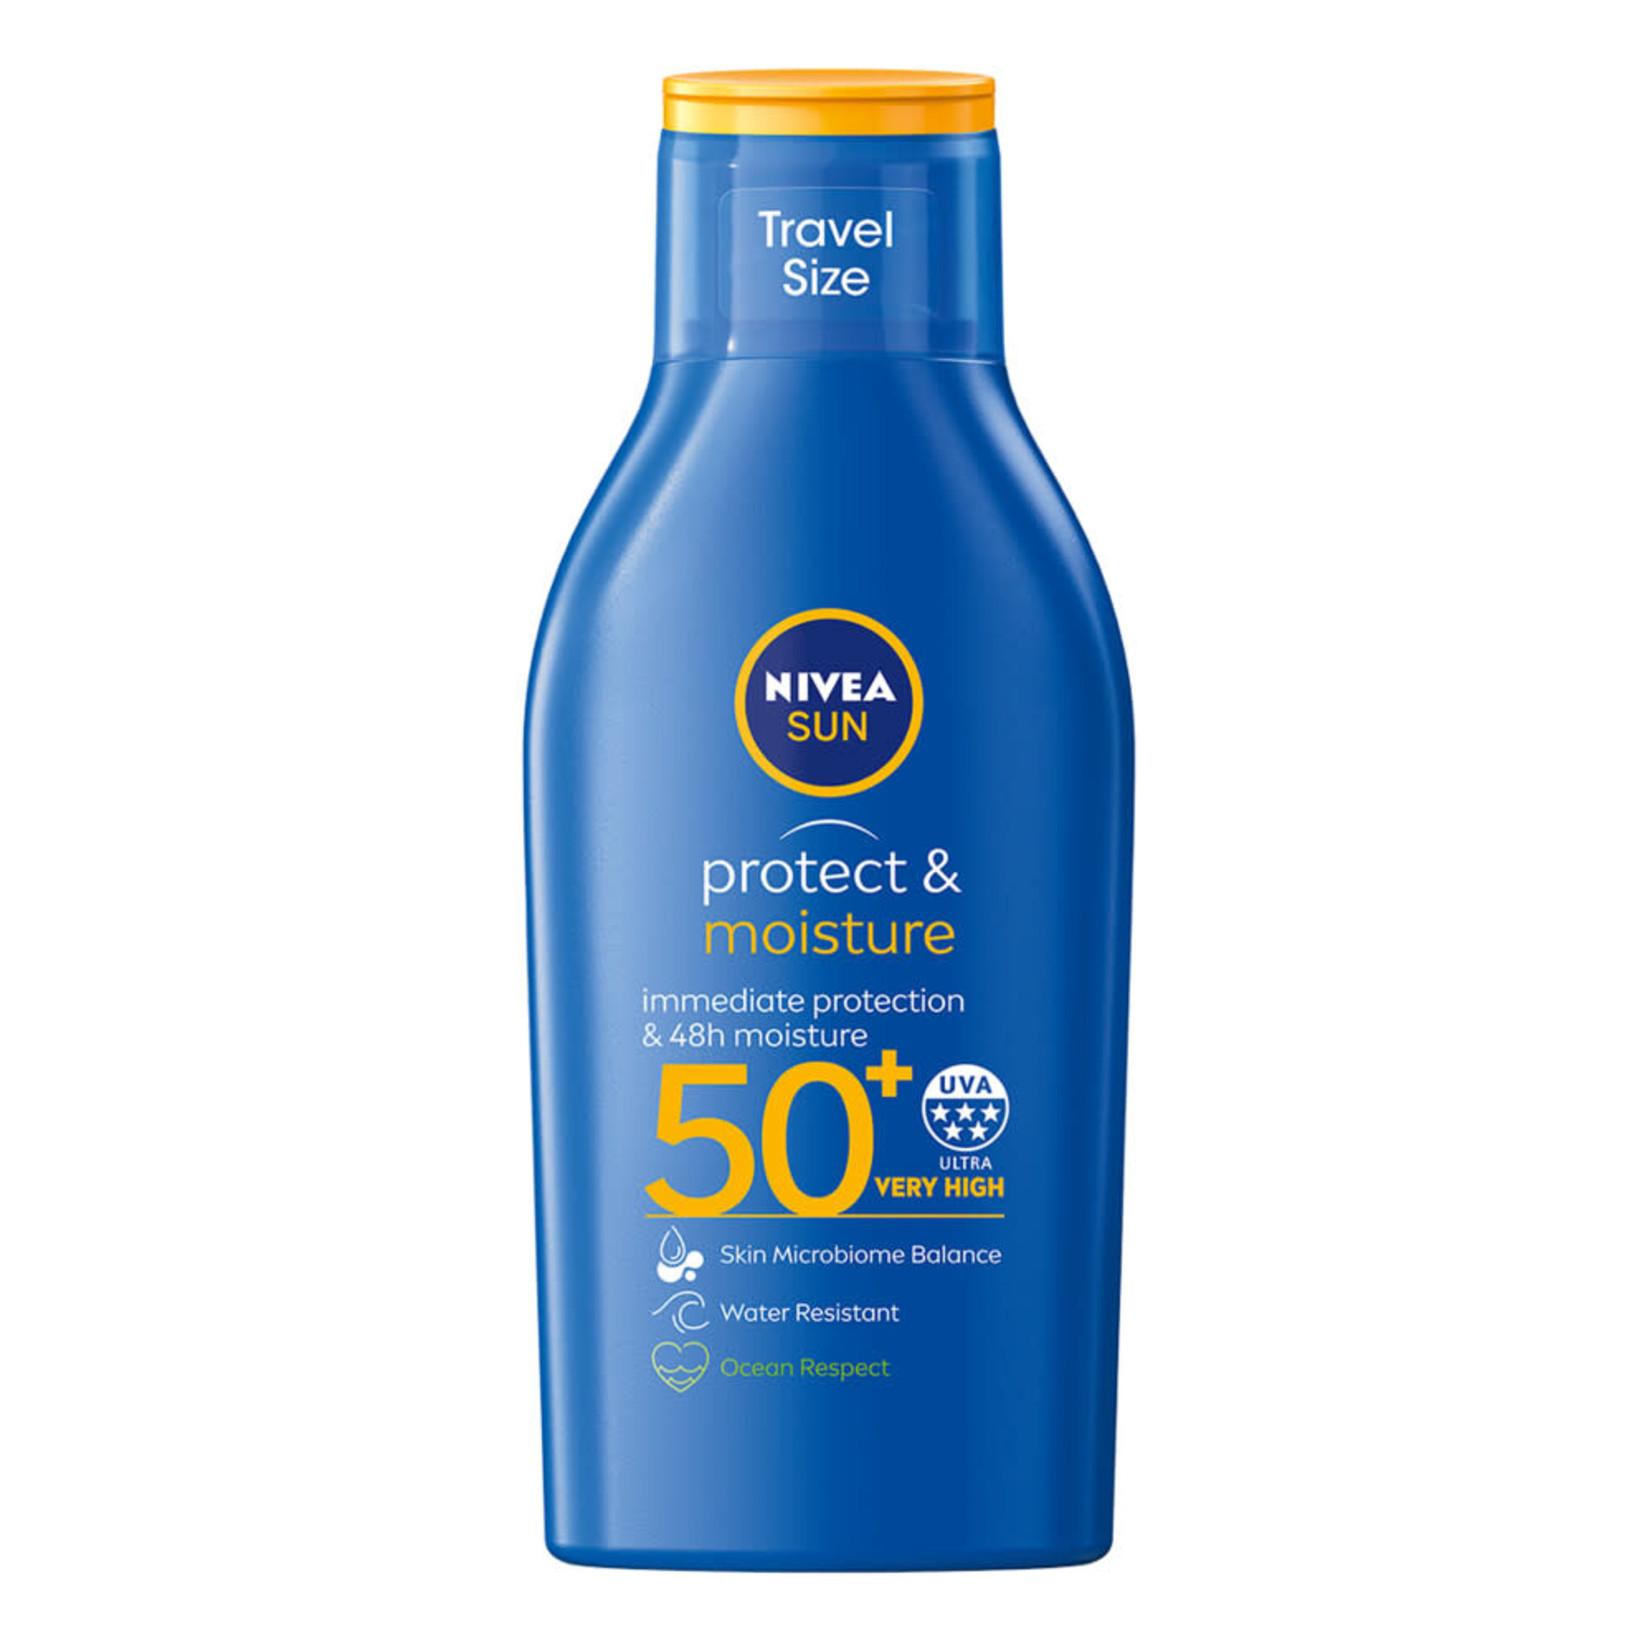 nivea NIVEA SUN Zonnebrand - Travel Size - SPF 50 - 100 ml